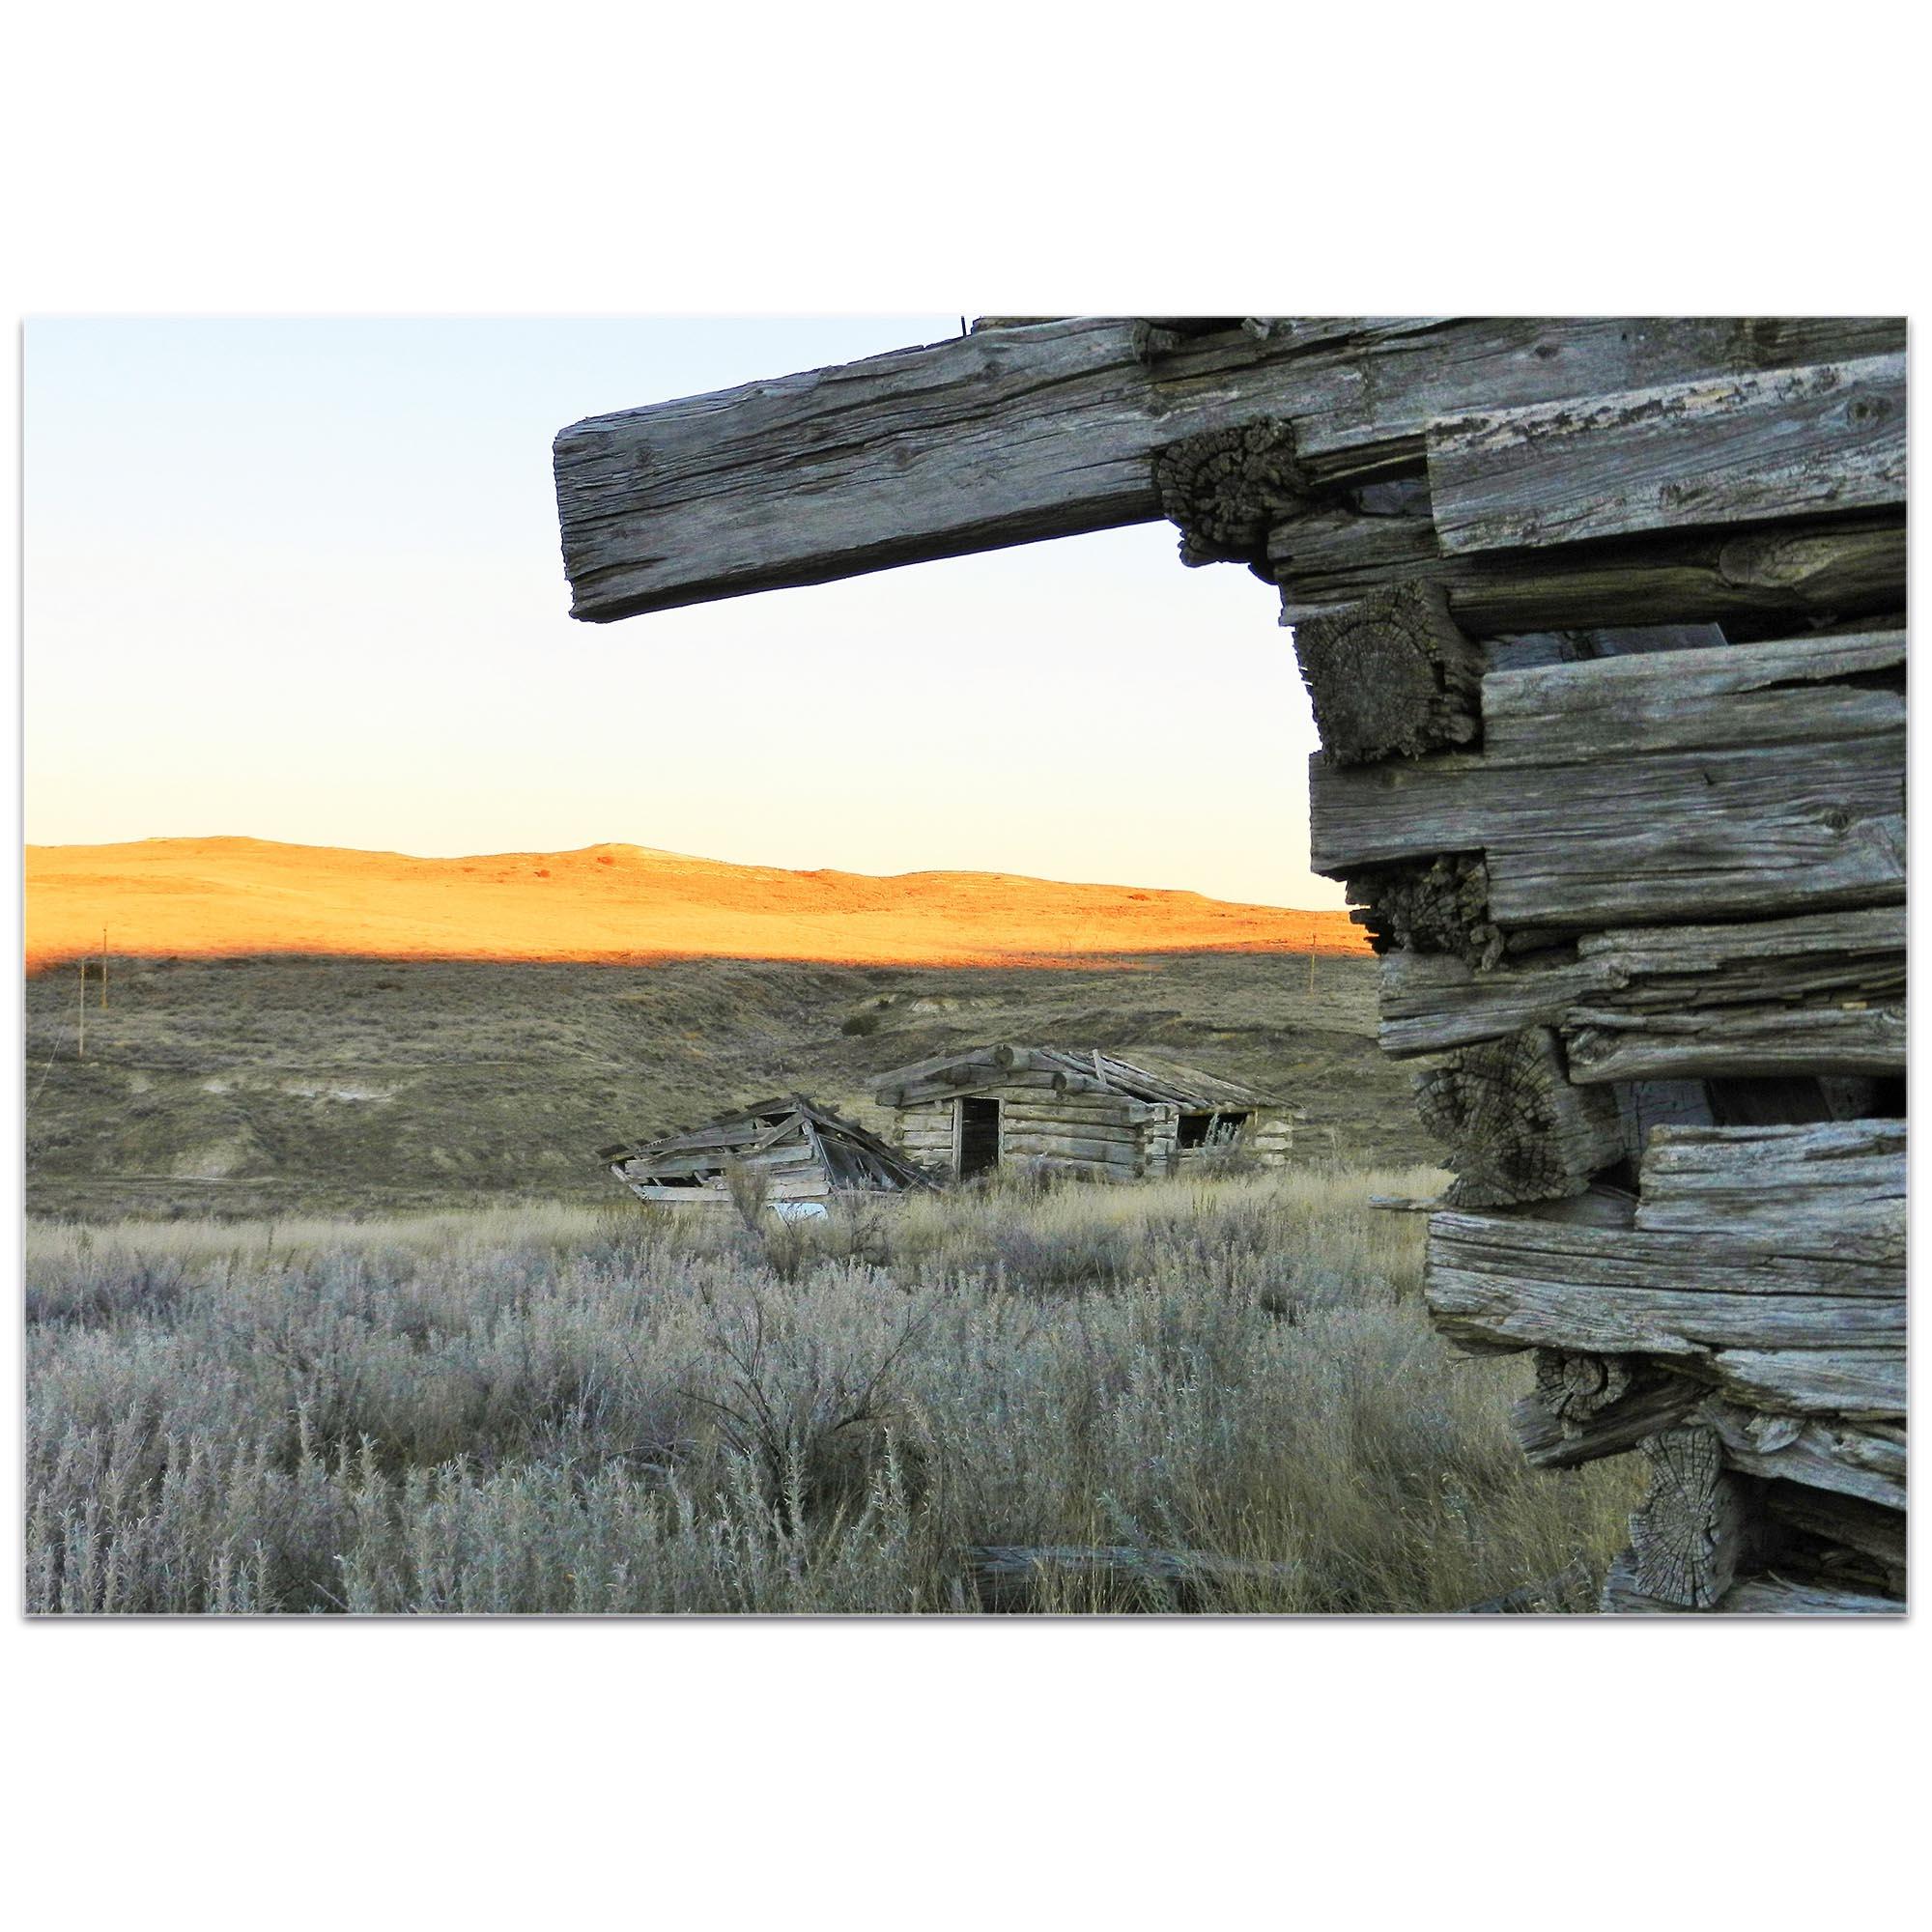 Western Wall Art 'The Corner' - American West Decor on Metal or Plexiglass - Image 2